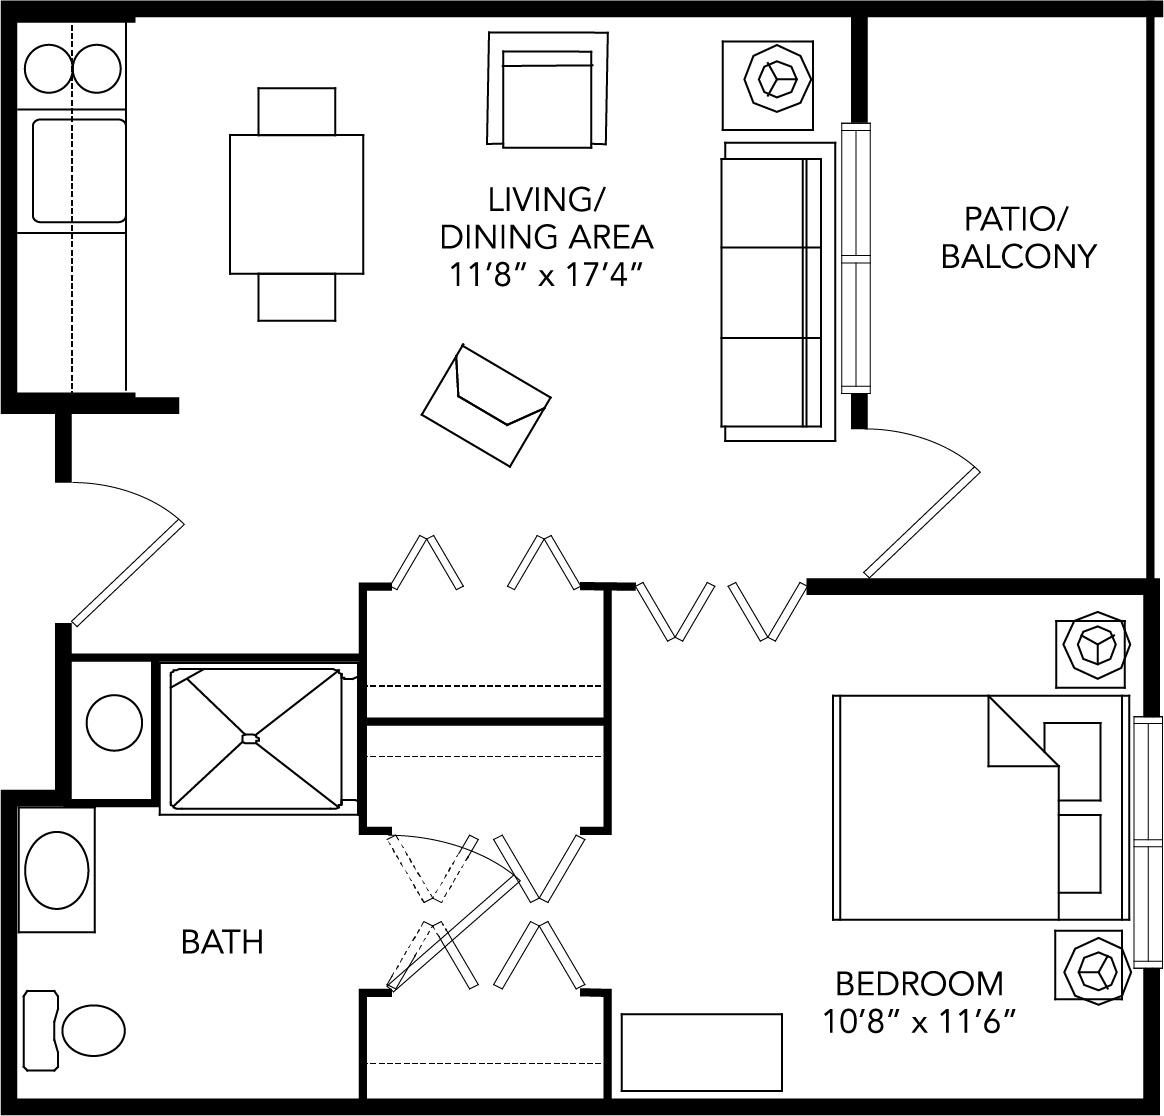 Assisted living private bedroom Franklin, VA